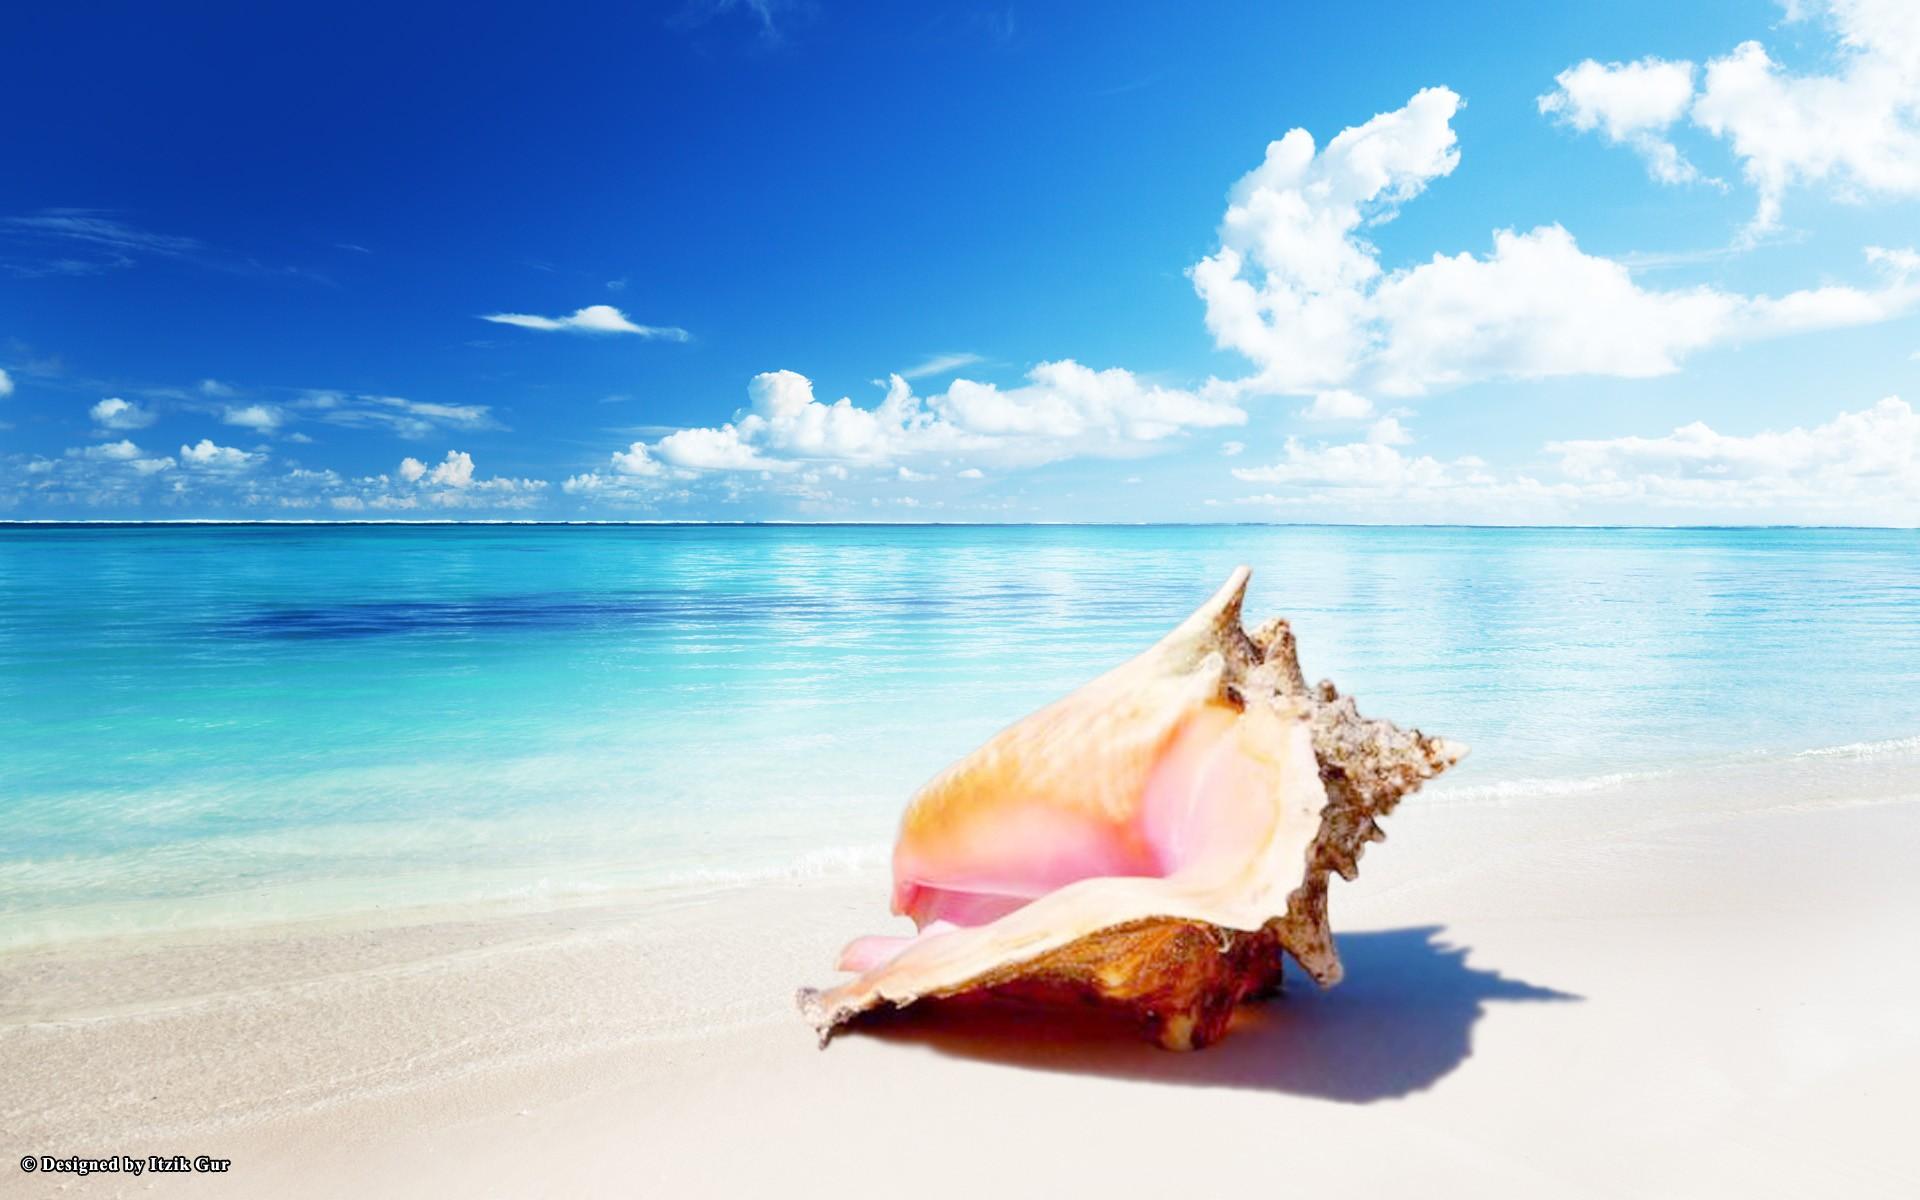 Картинка, открытка с море